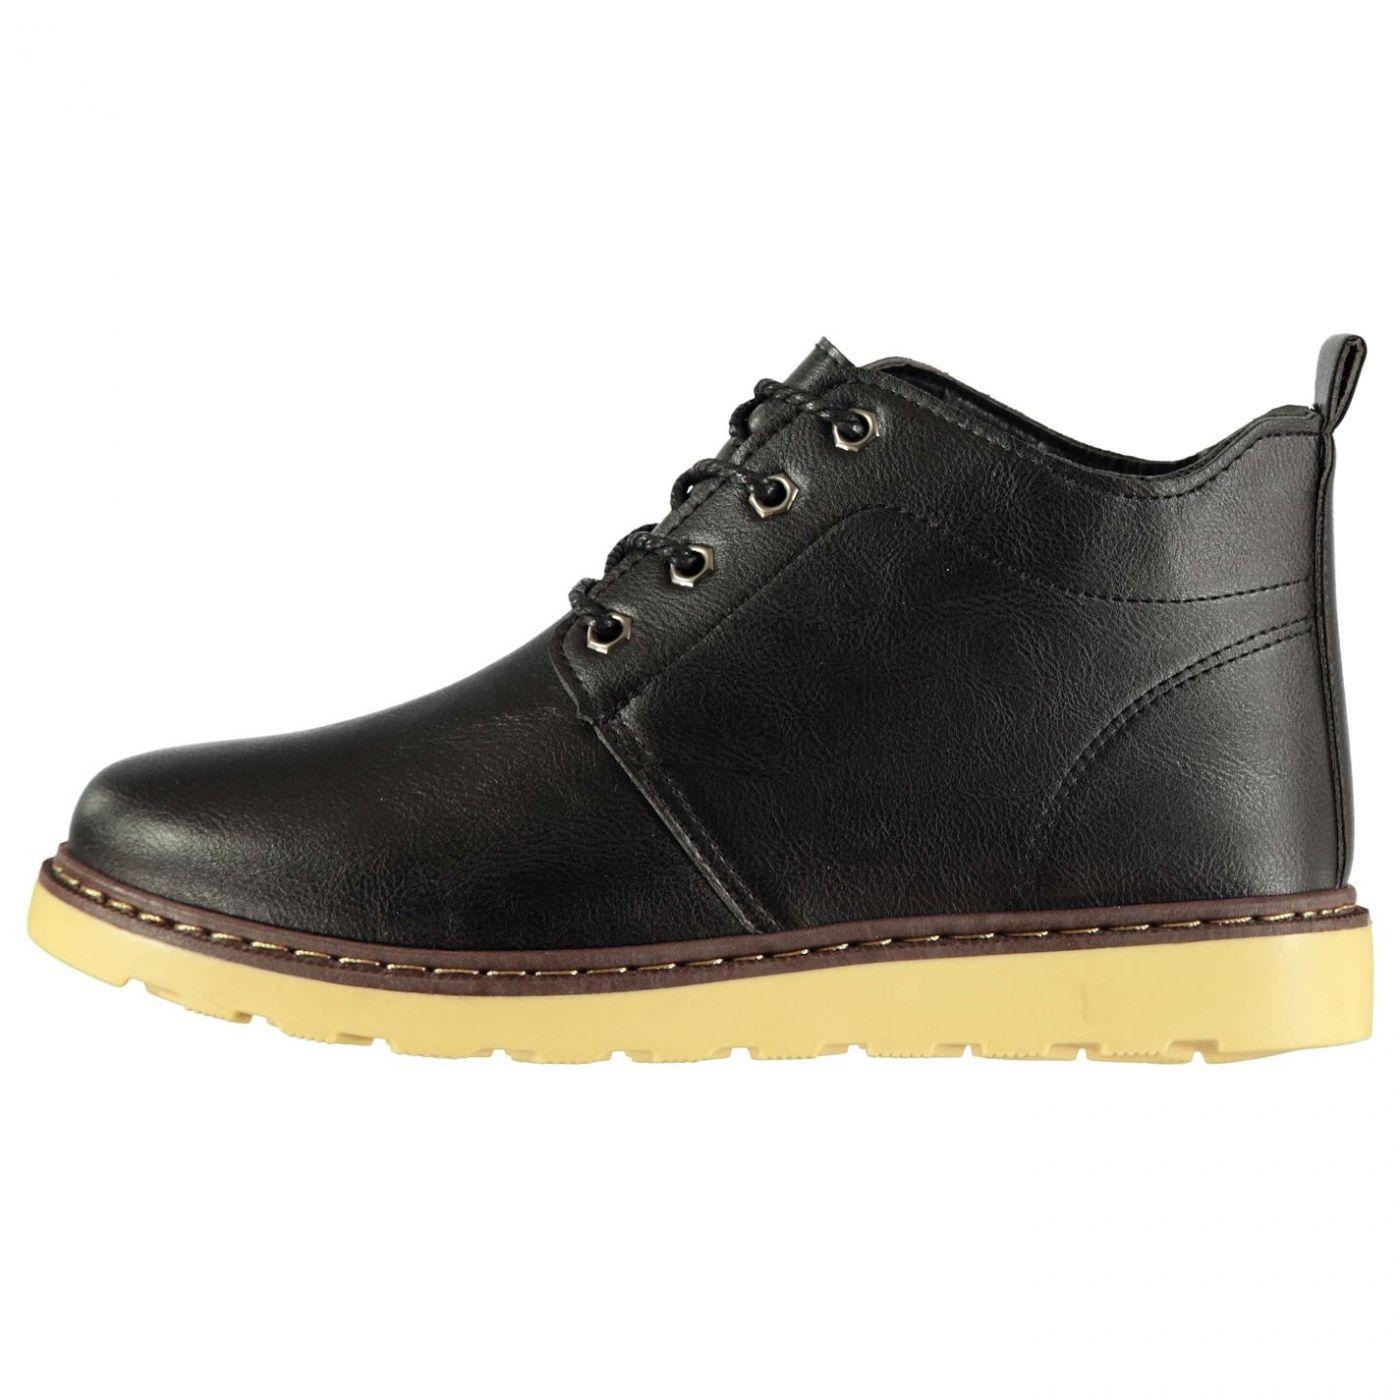 Lee Cooper Riv pánske topánky